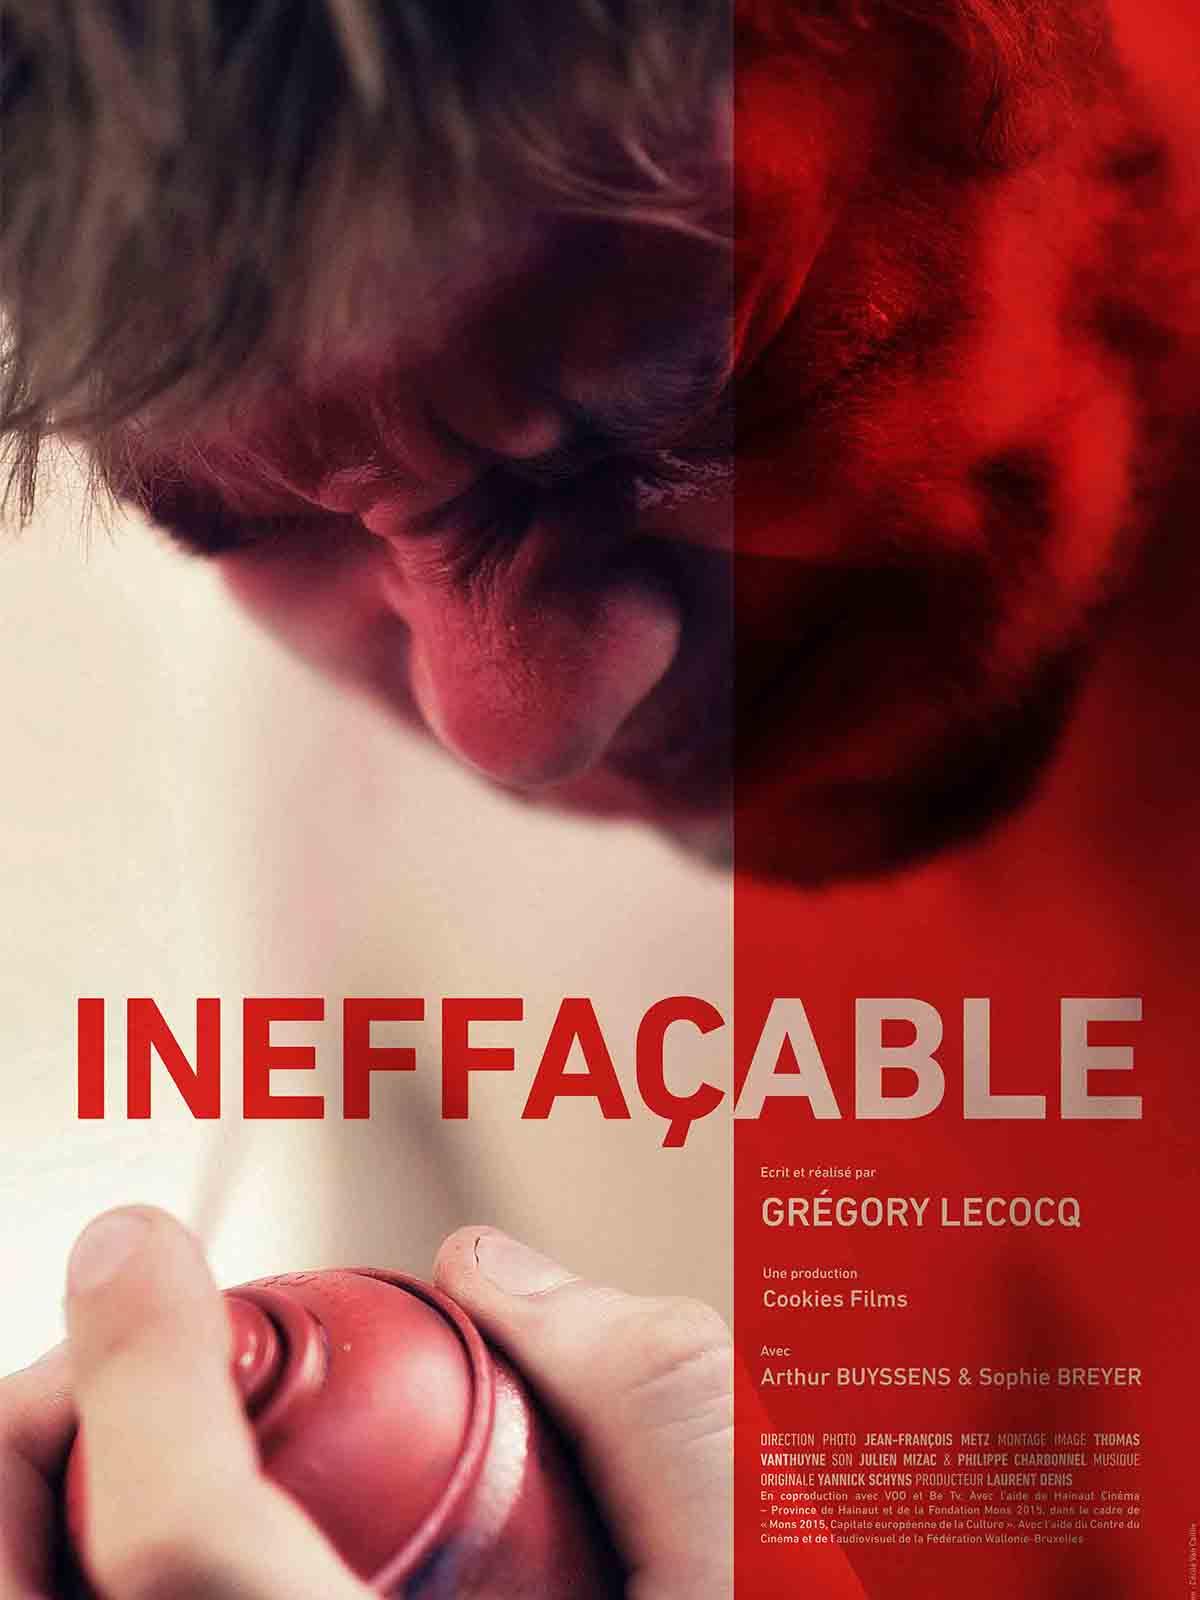 fic_ineffacable_vertical